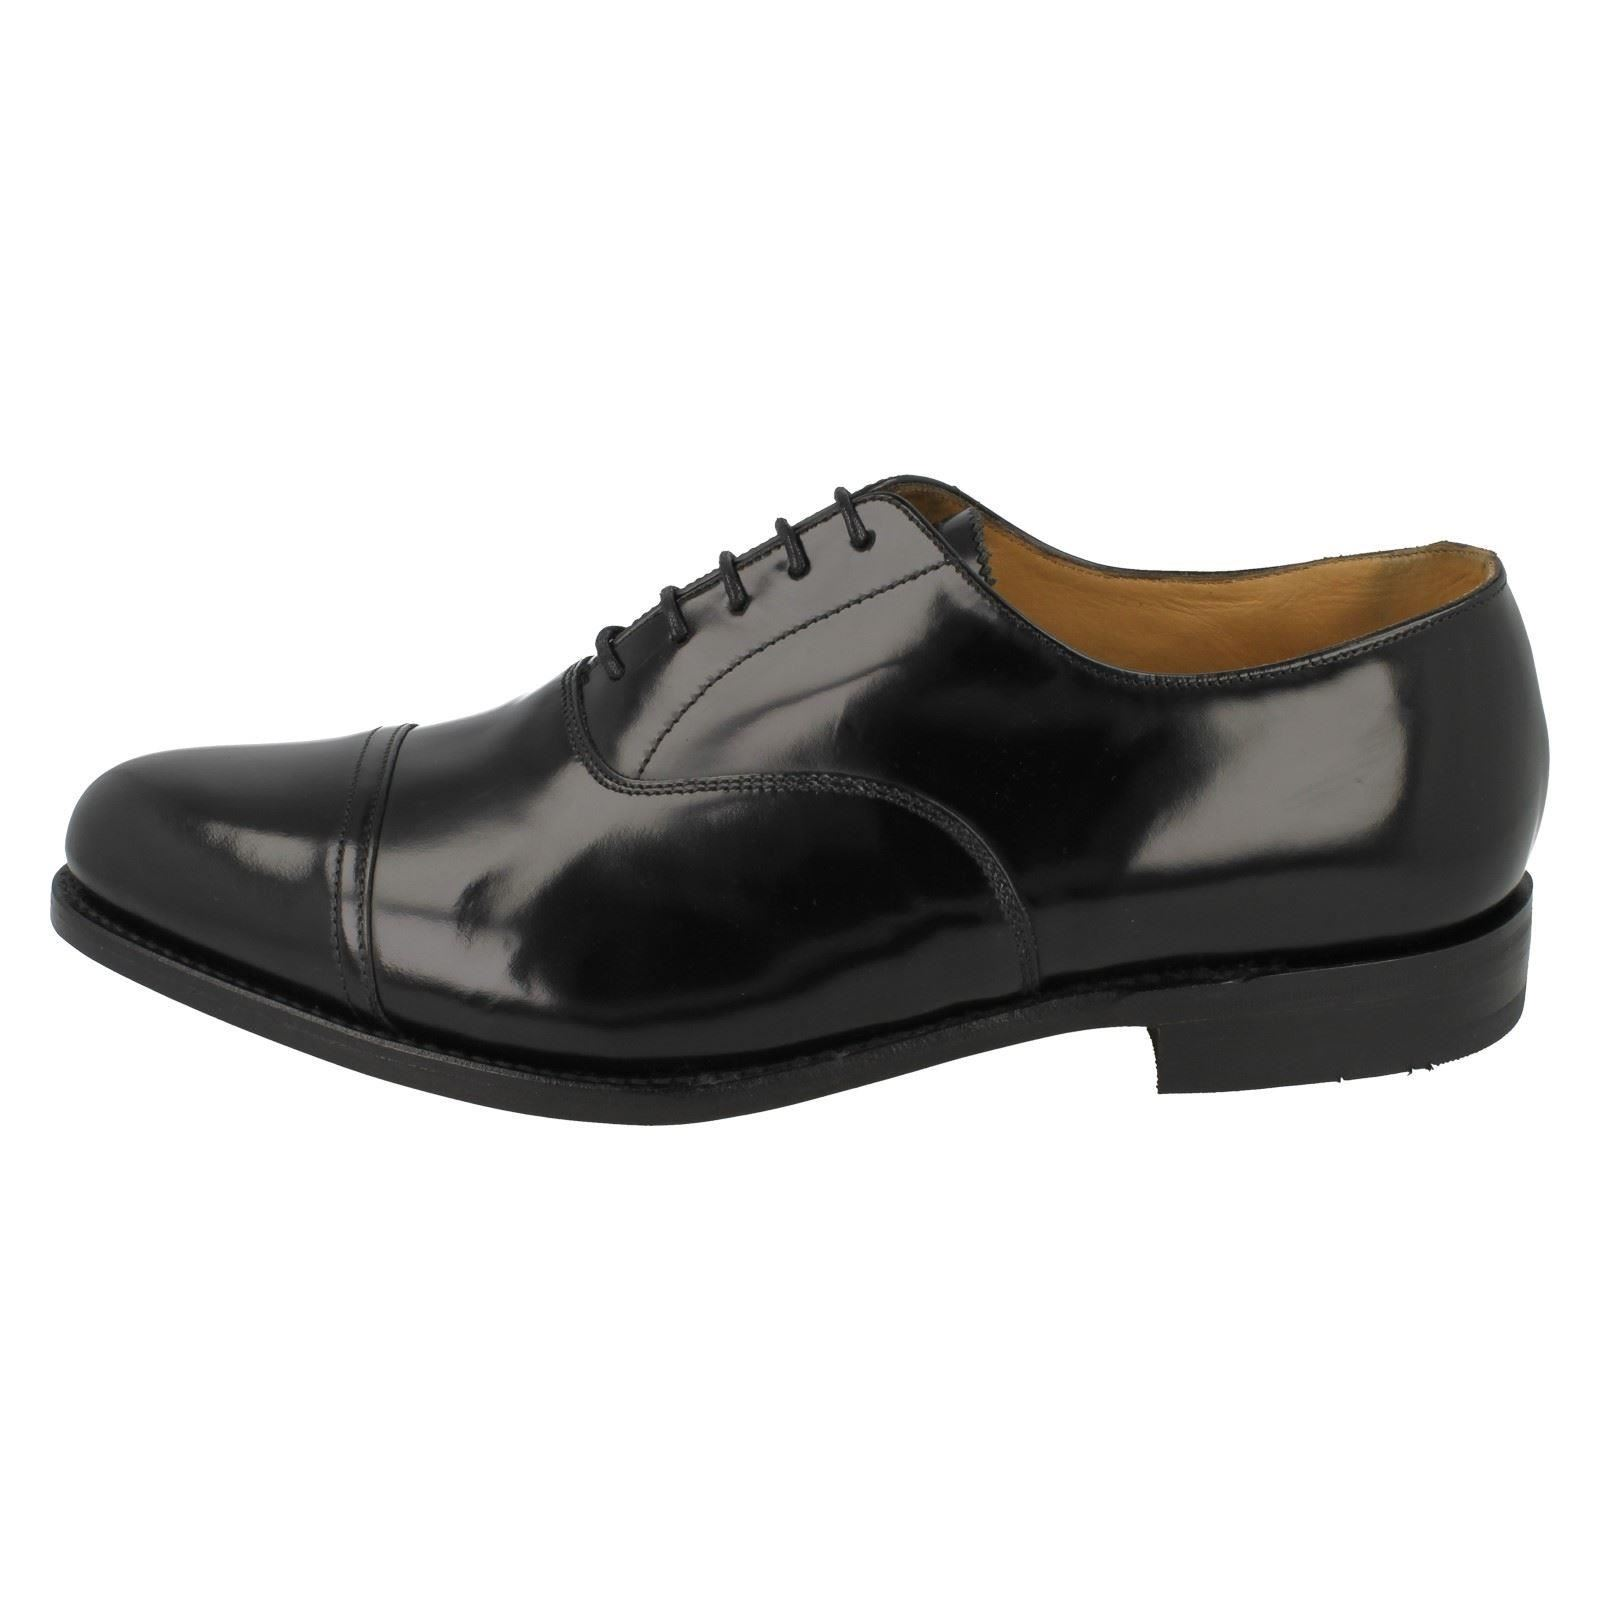 Mens Fitting Loake schwarz Formal Schuhes Fitting Mens G Label - Elland d6759c